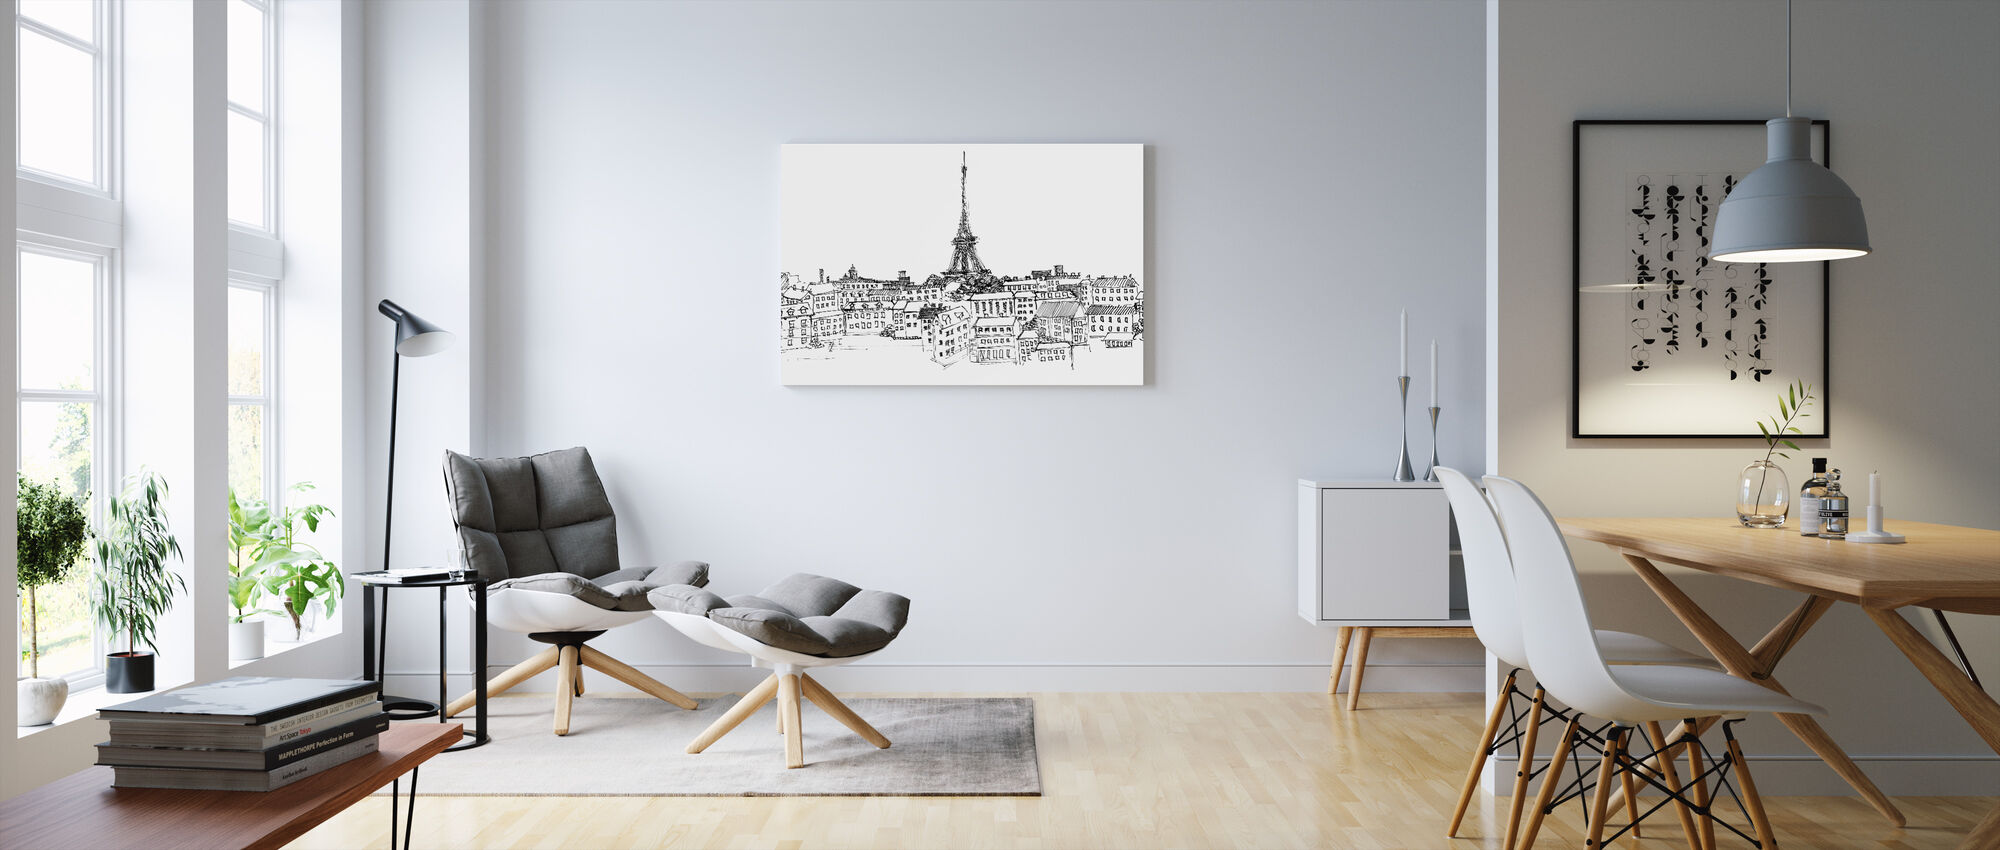 Avery Tillmon - Paris Skyline - Canvas print - Living Room